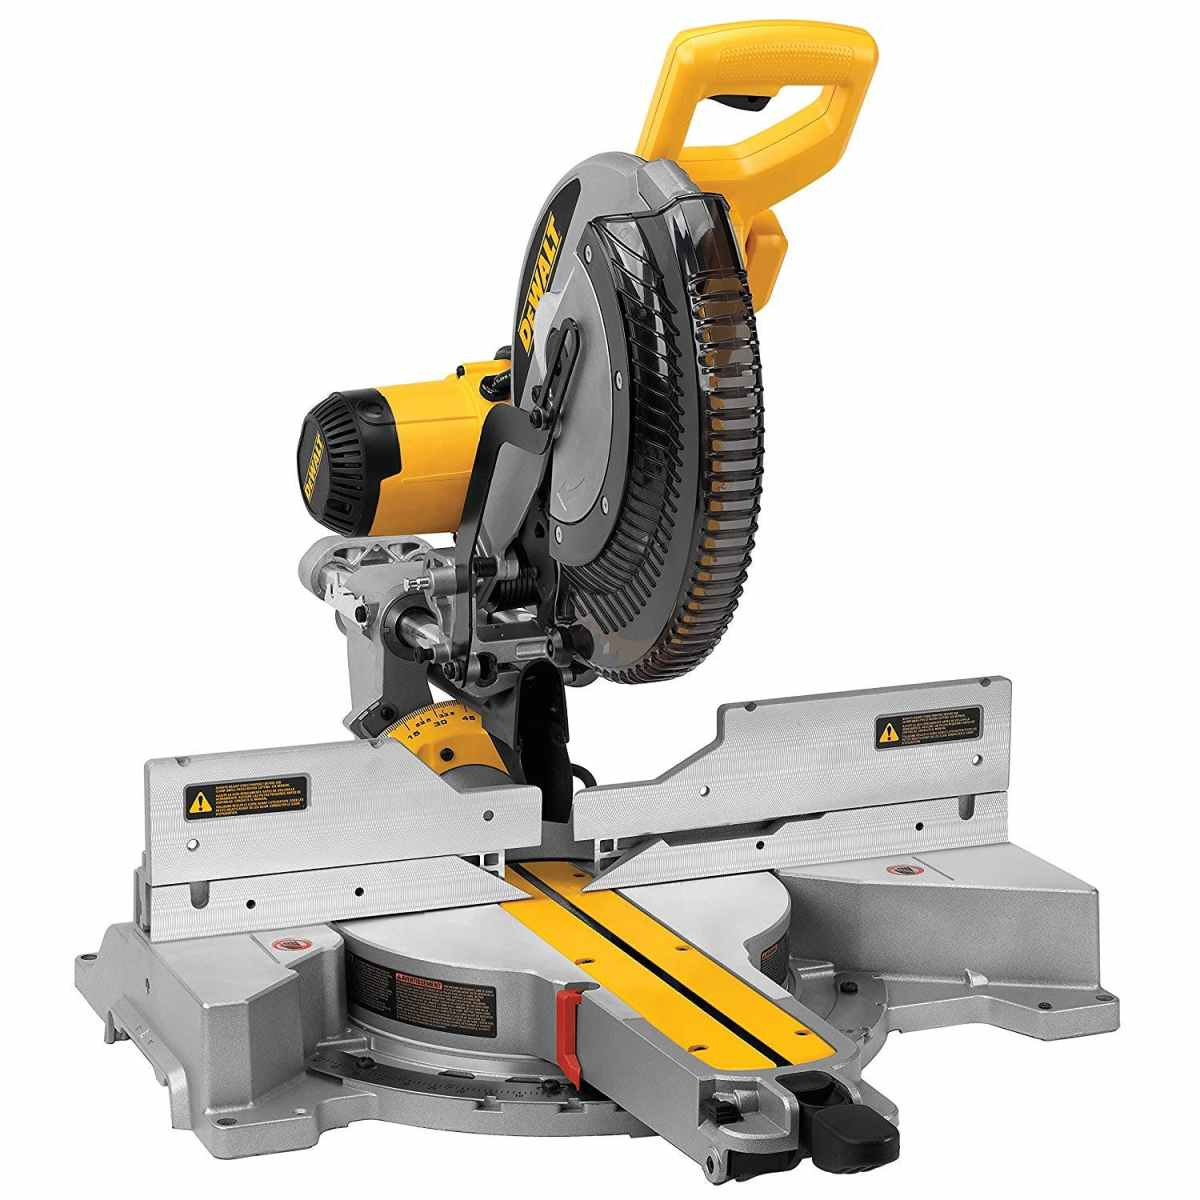 miter saw, tools, DIY